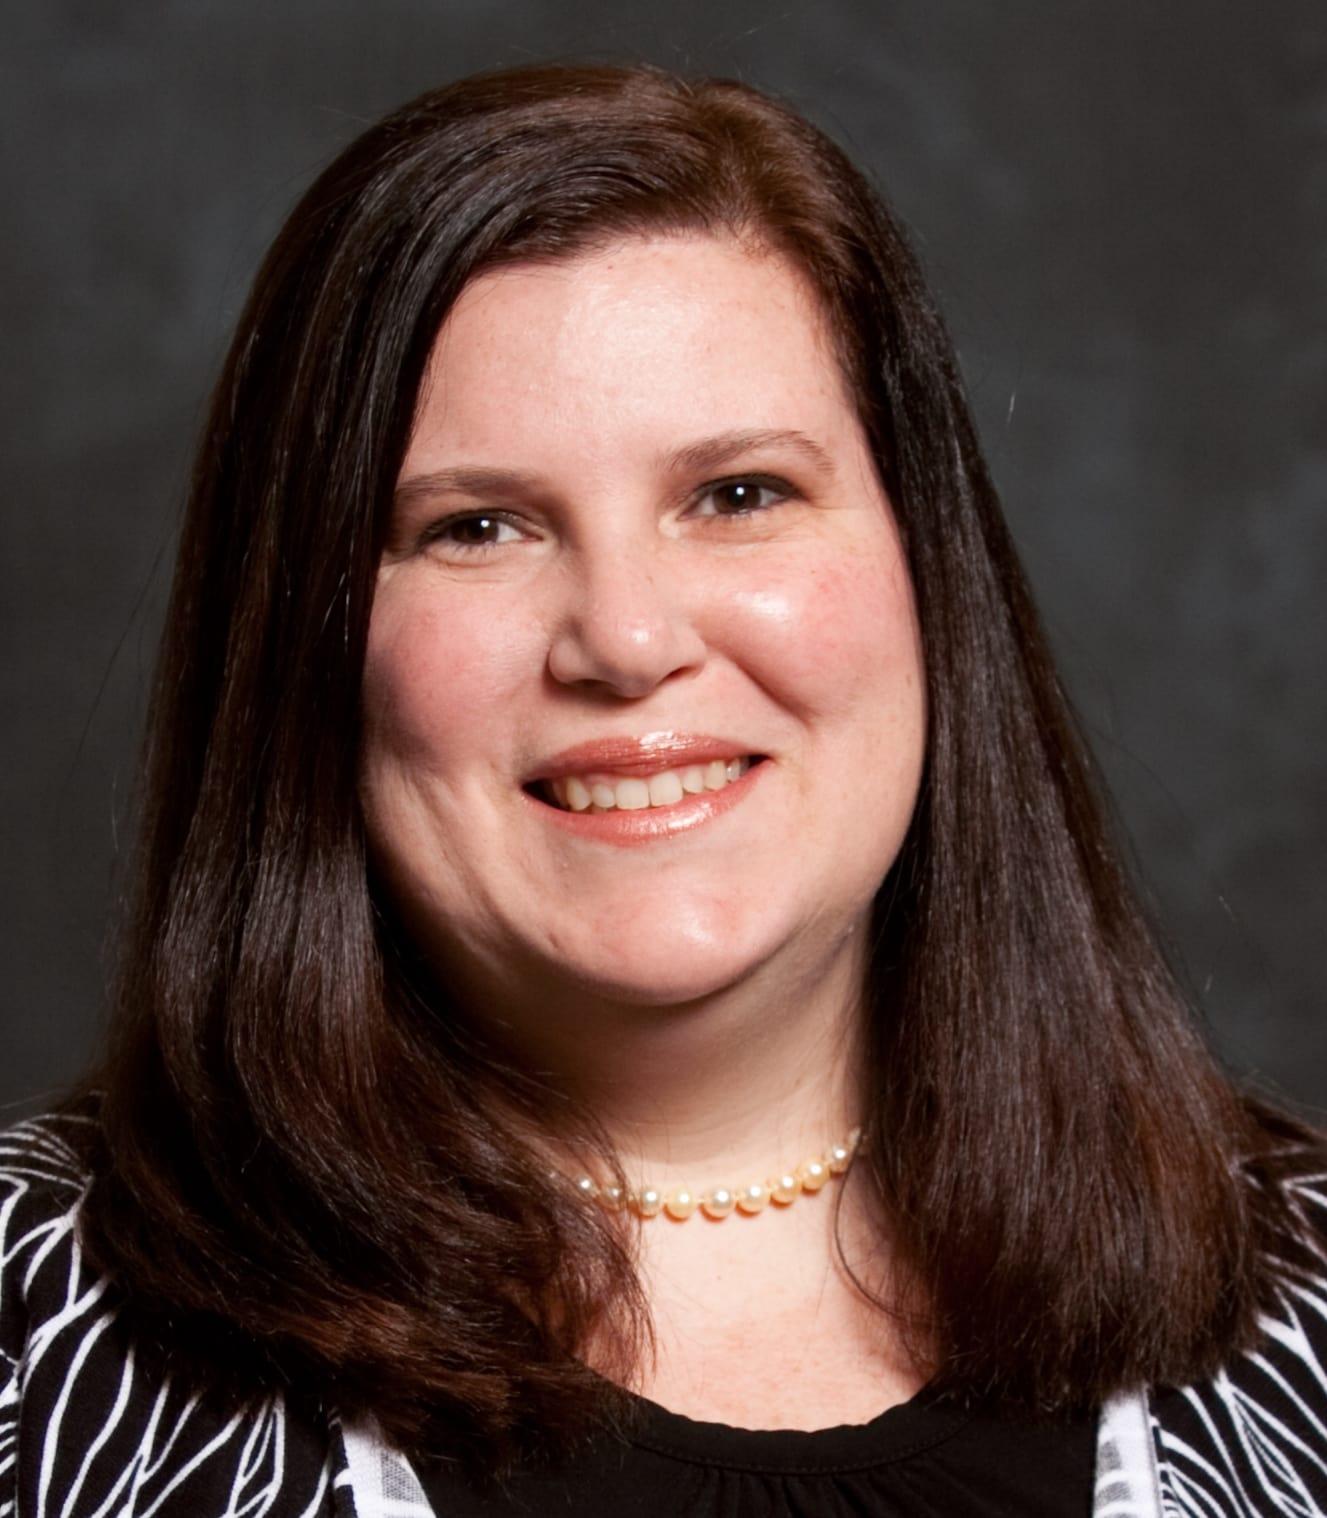 Ana L Macdowell, MD Allergy & Immunology